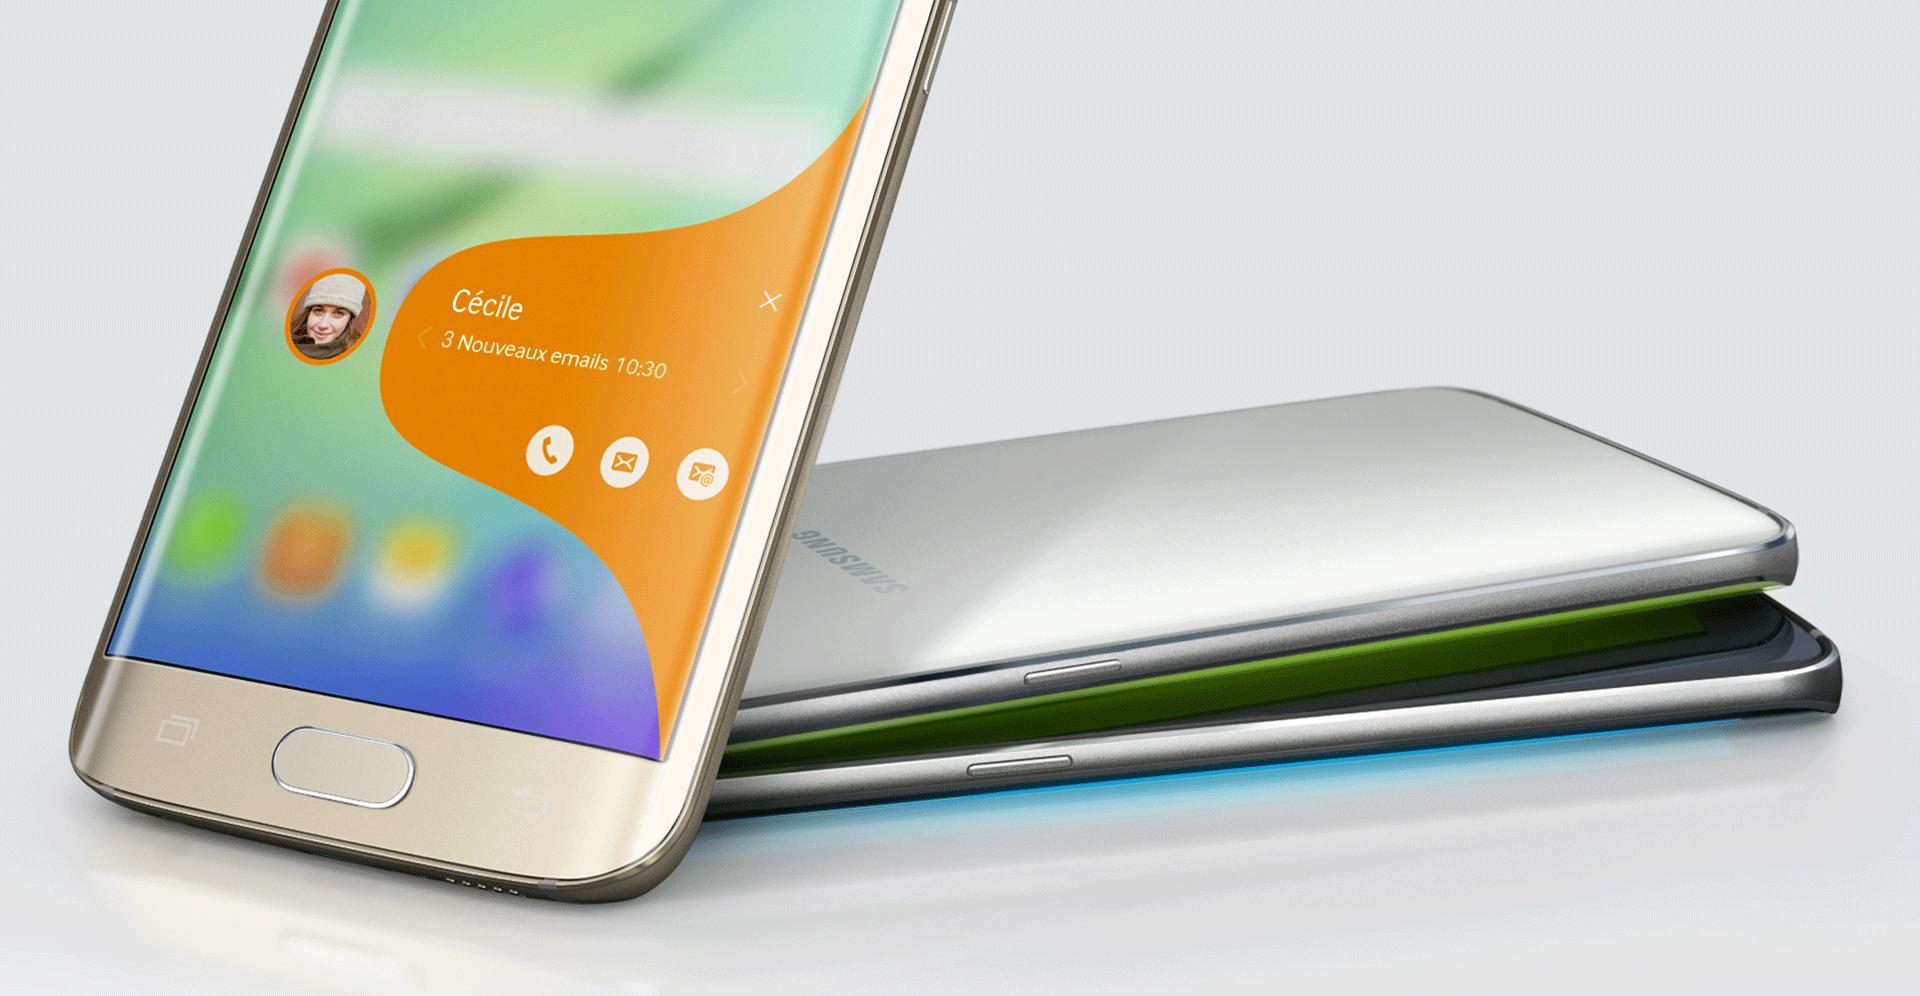 Galaxy S6 Edge Tunisie